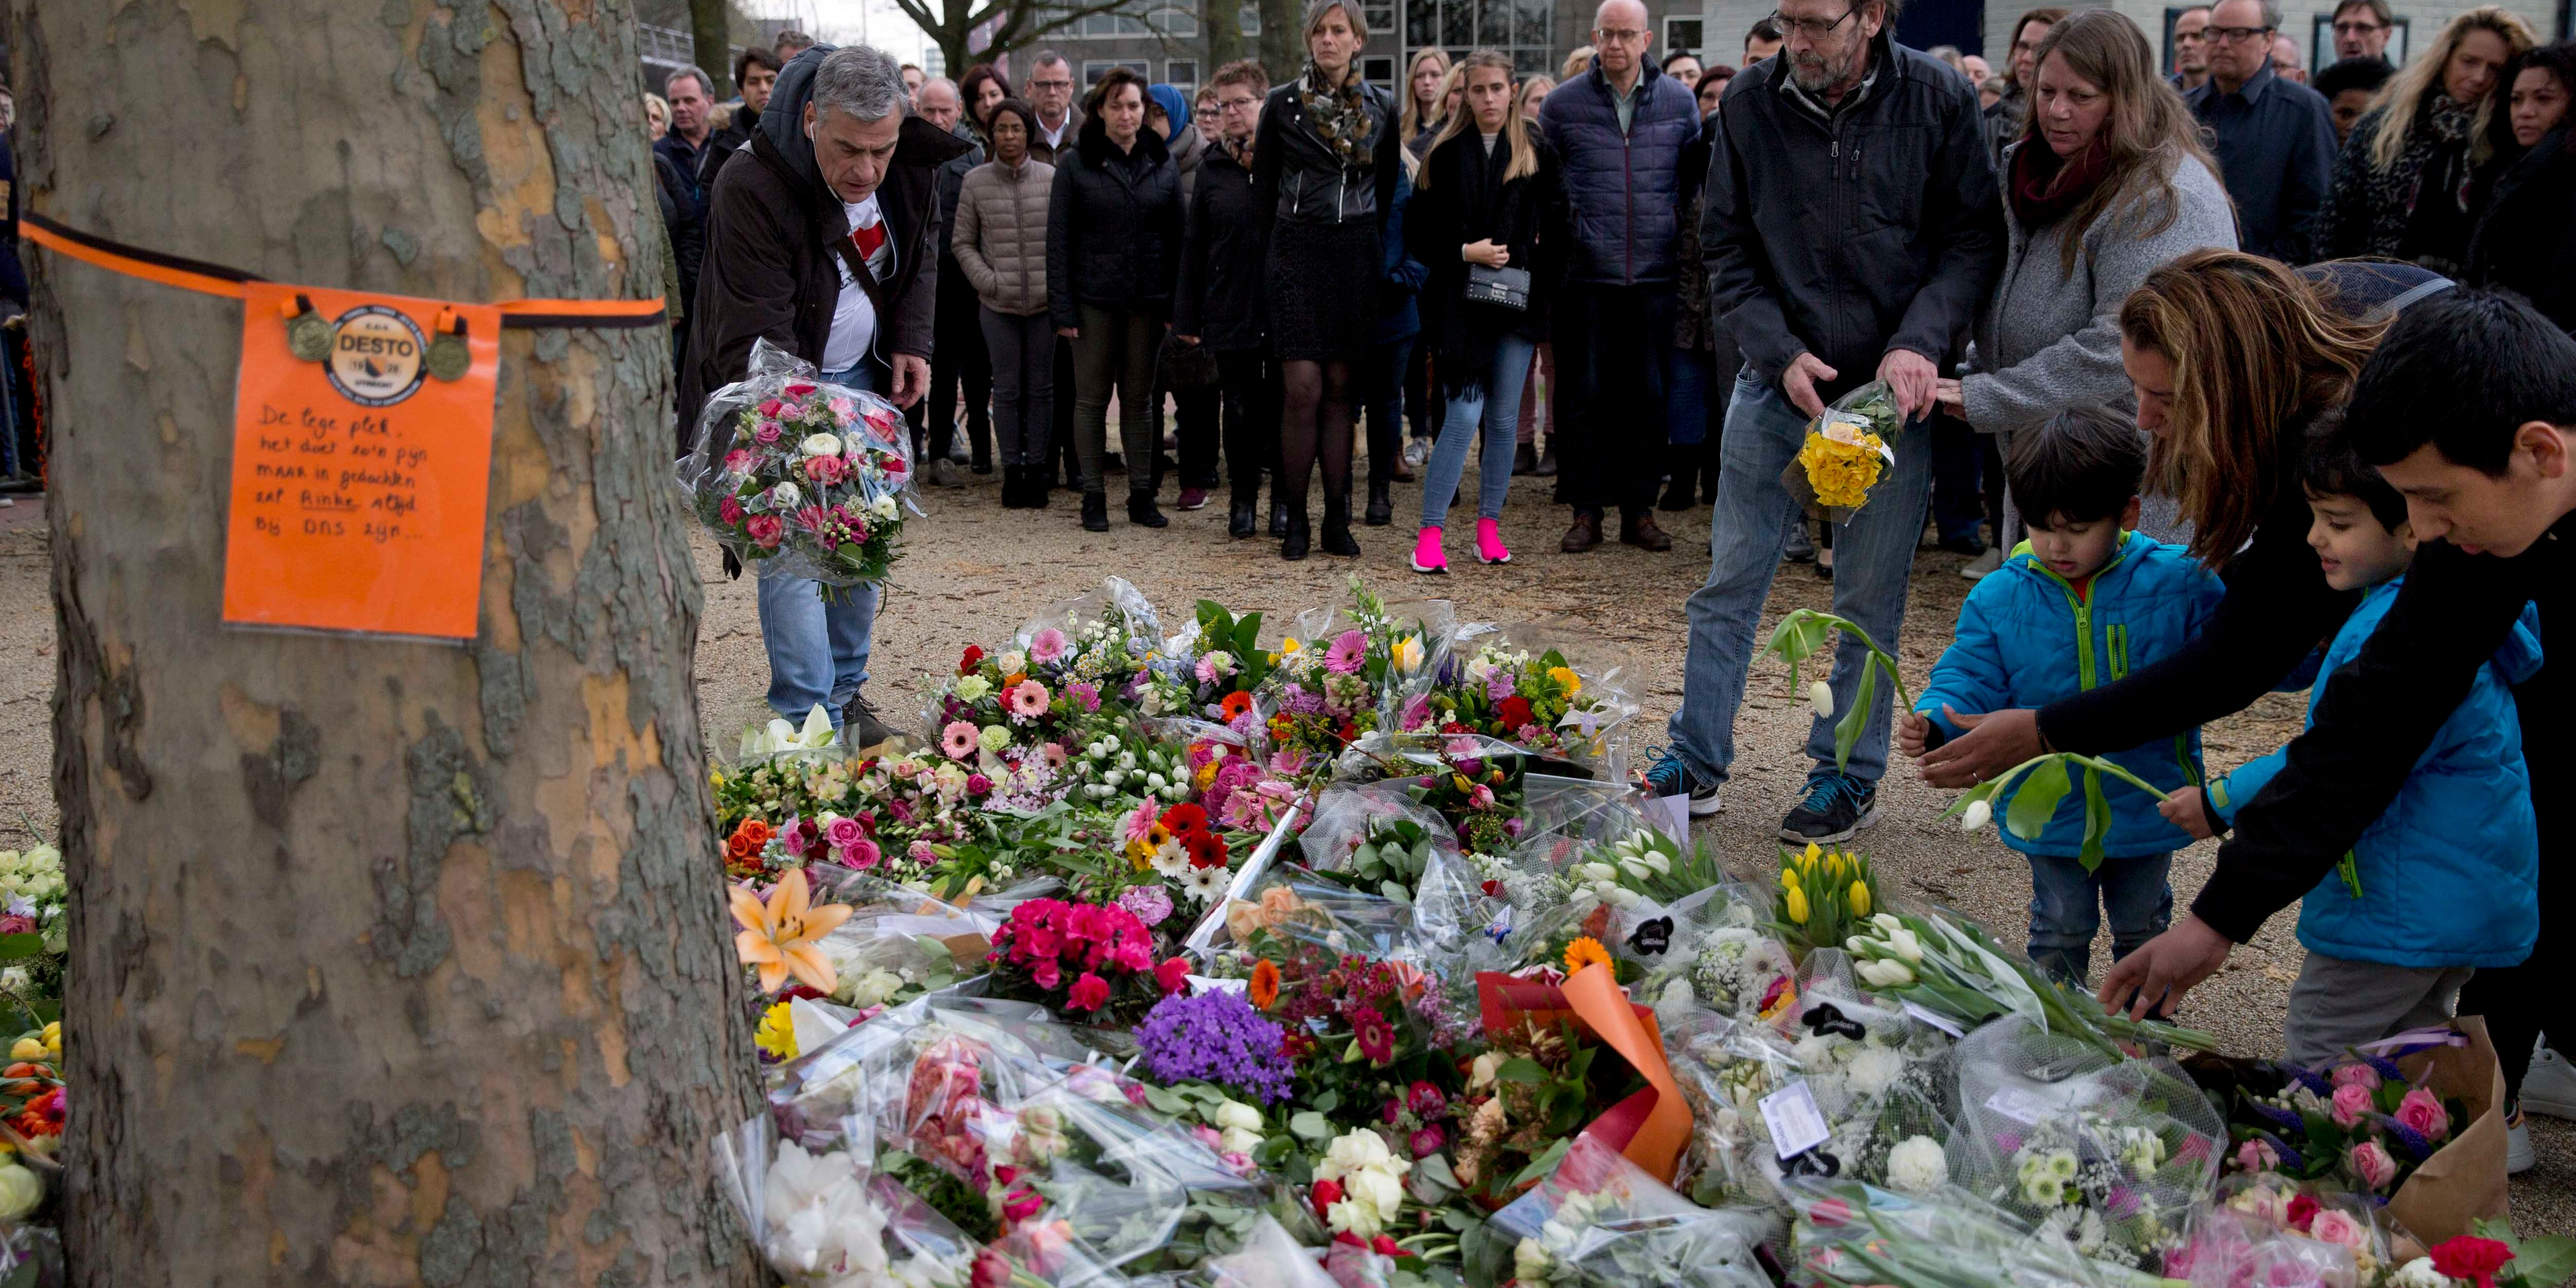 Dutch prosecutors consider terror motive in tram shooting